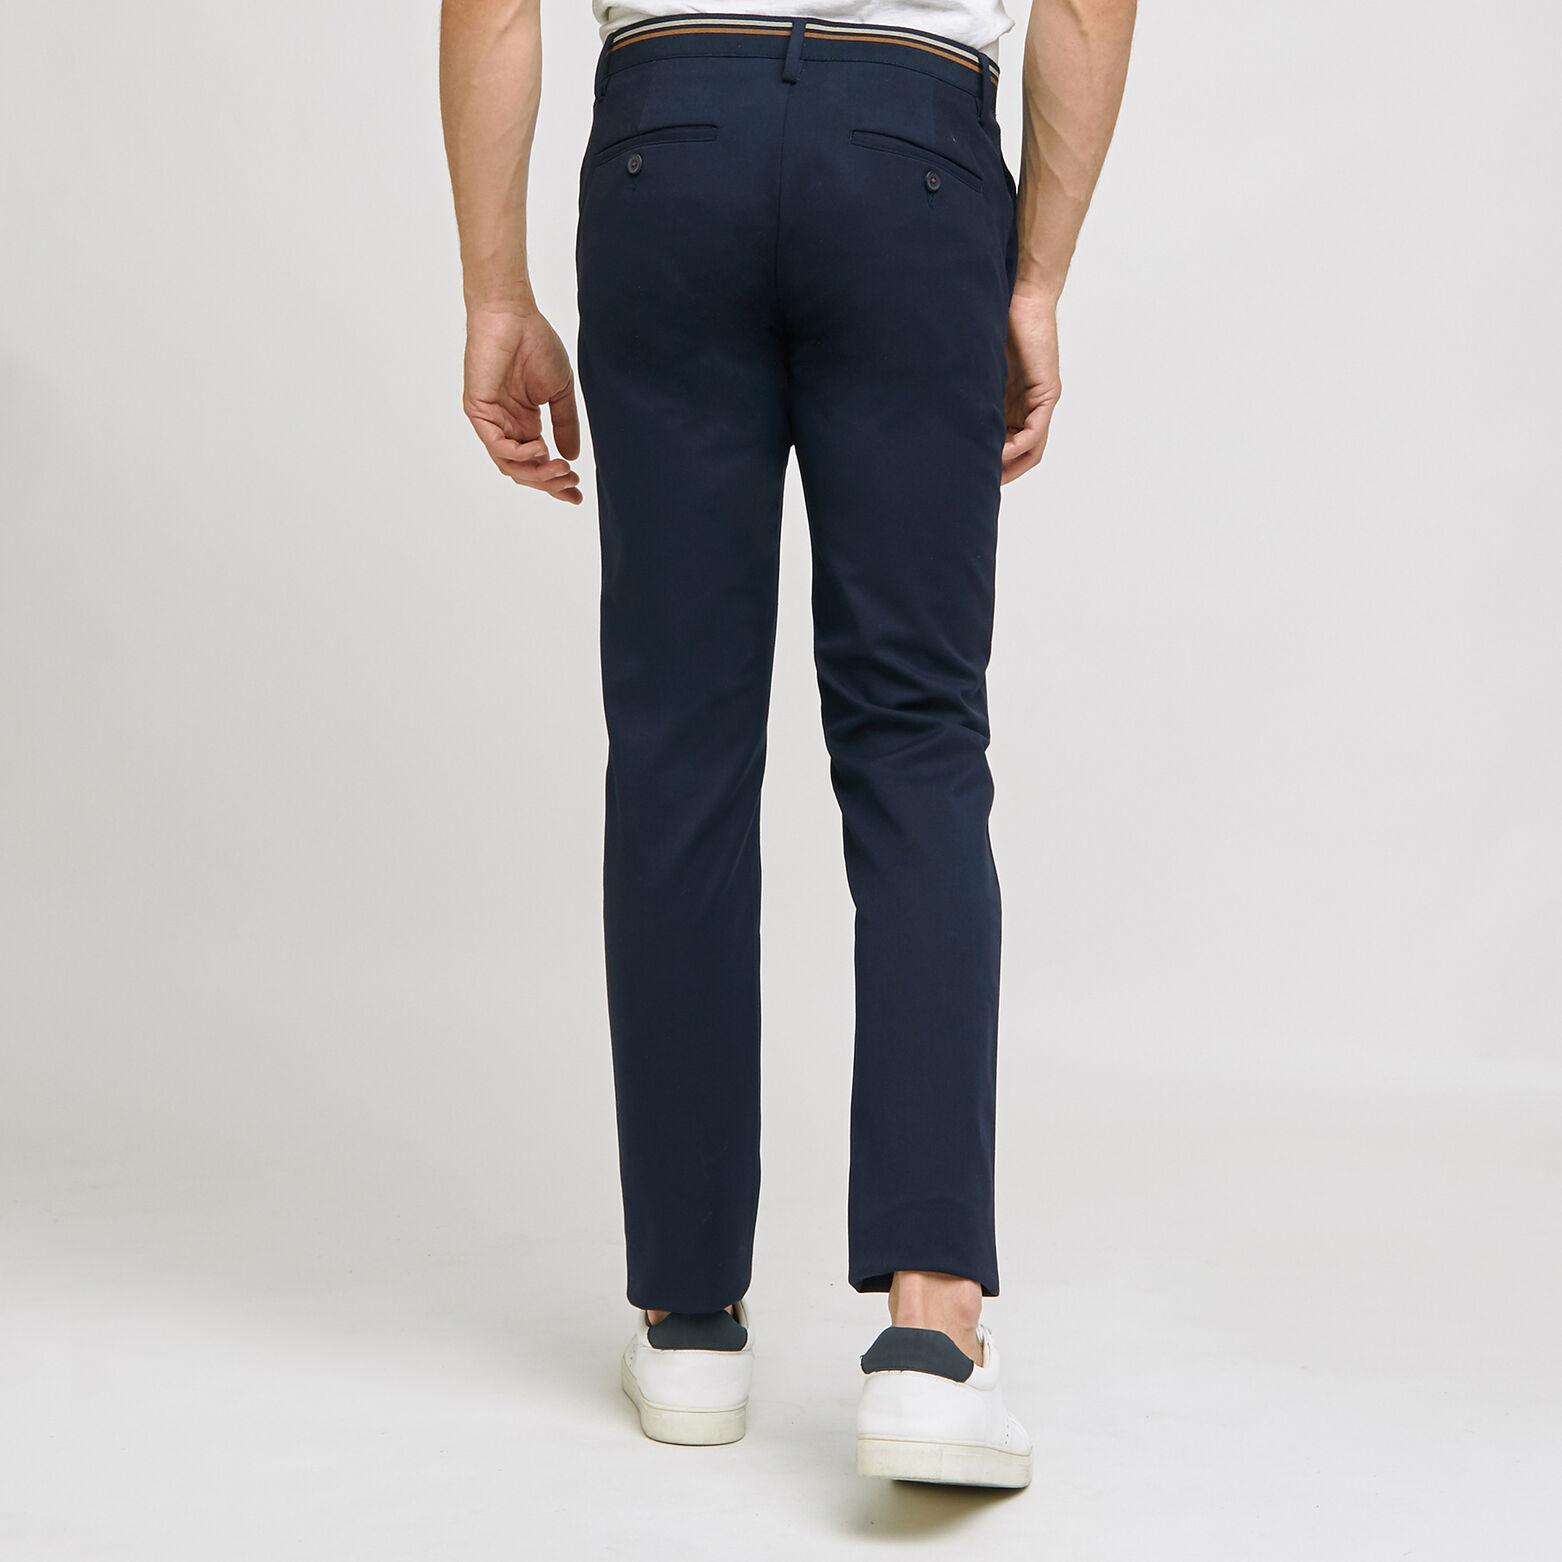 Pantalon chino uni ceinture elastiquée